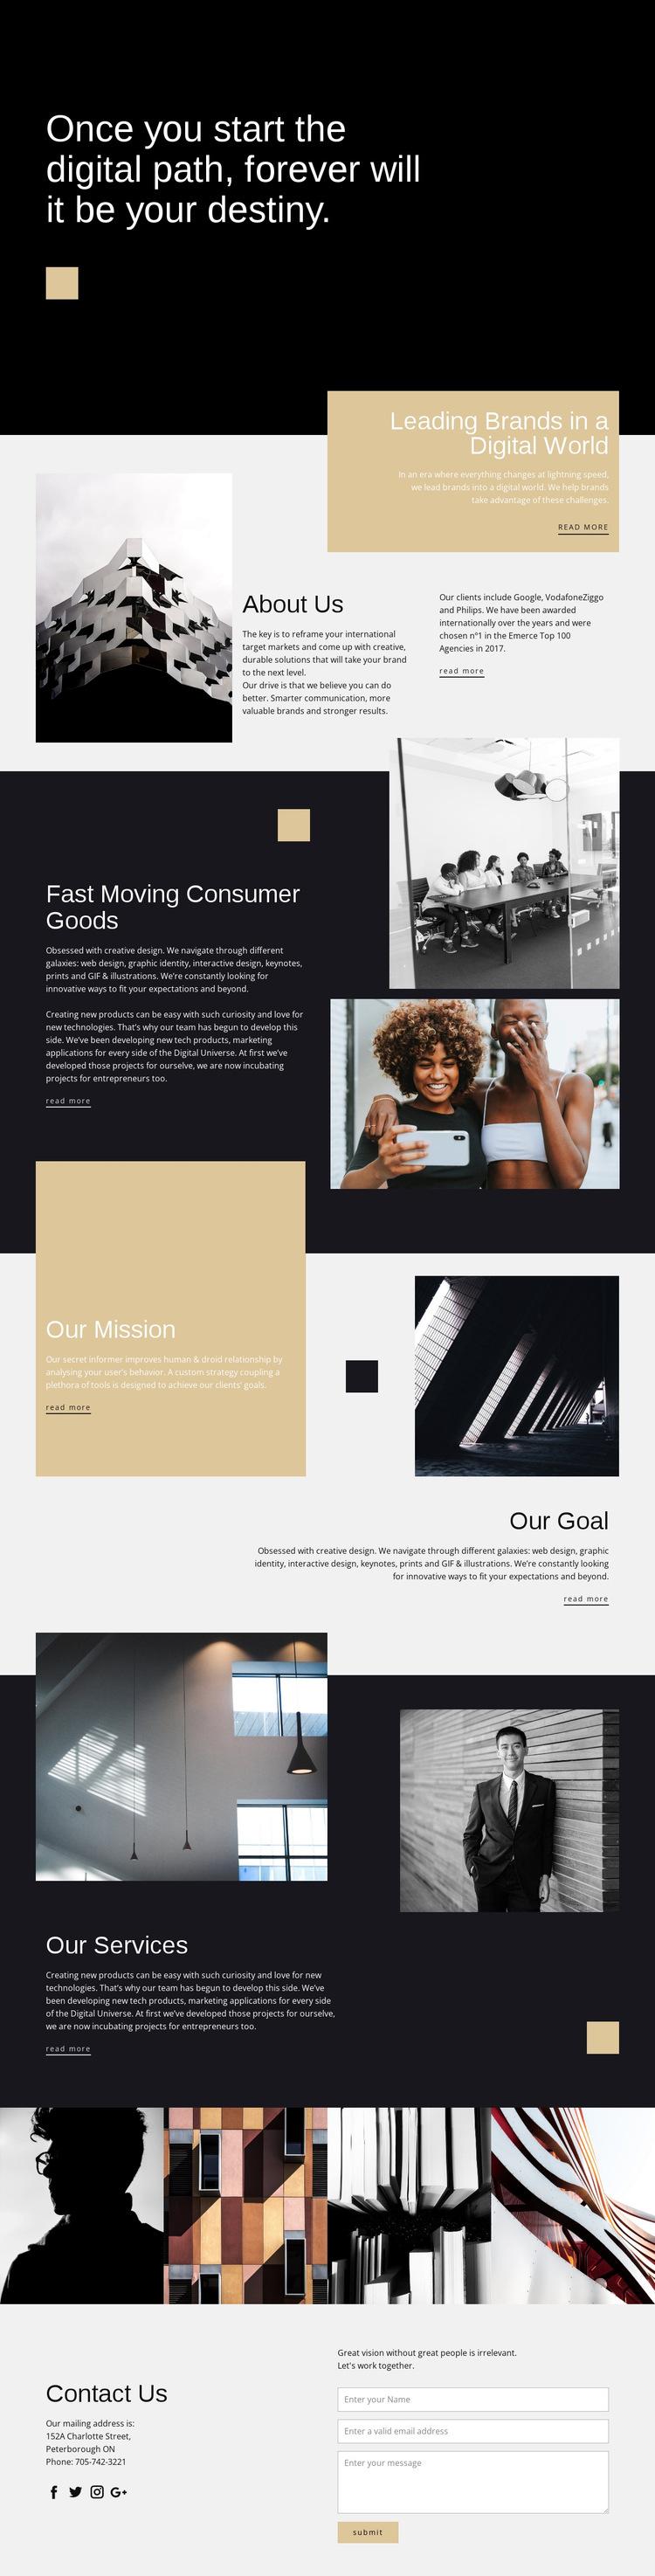 Destiny photo studio HTML5 Template